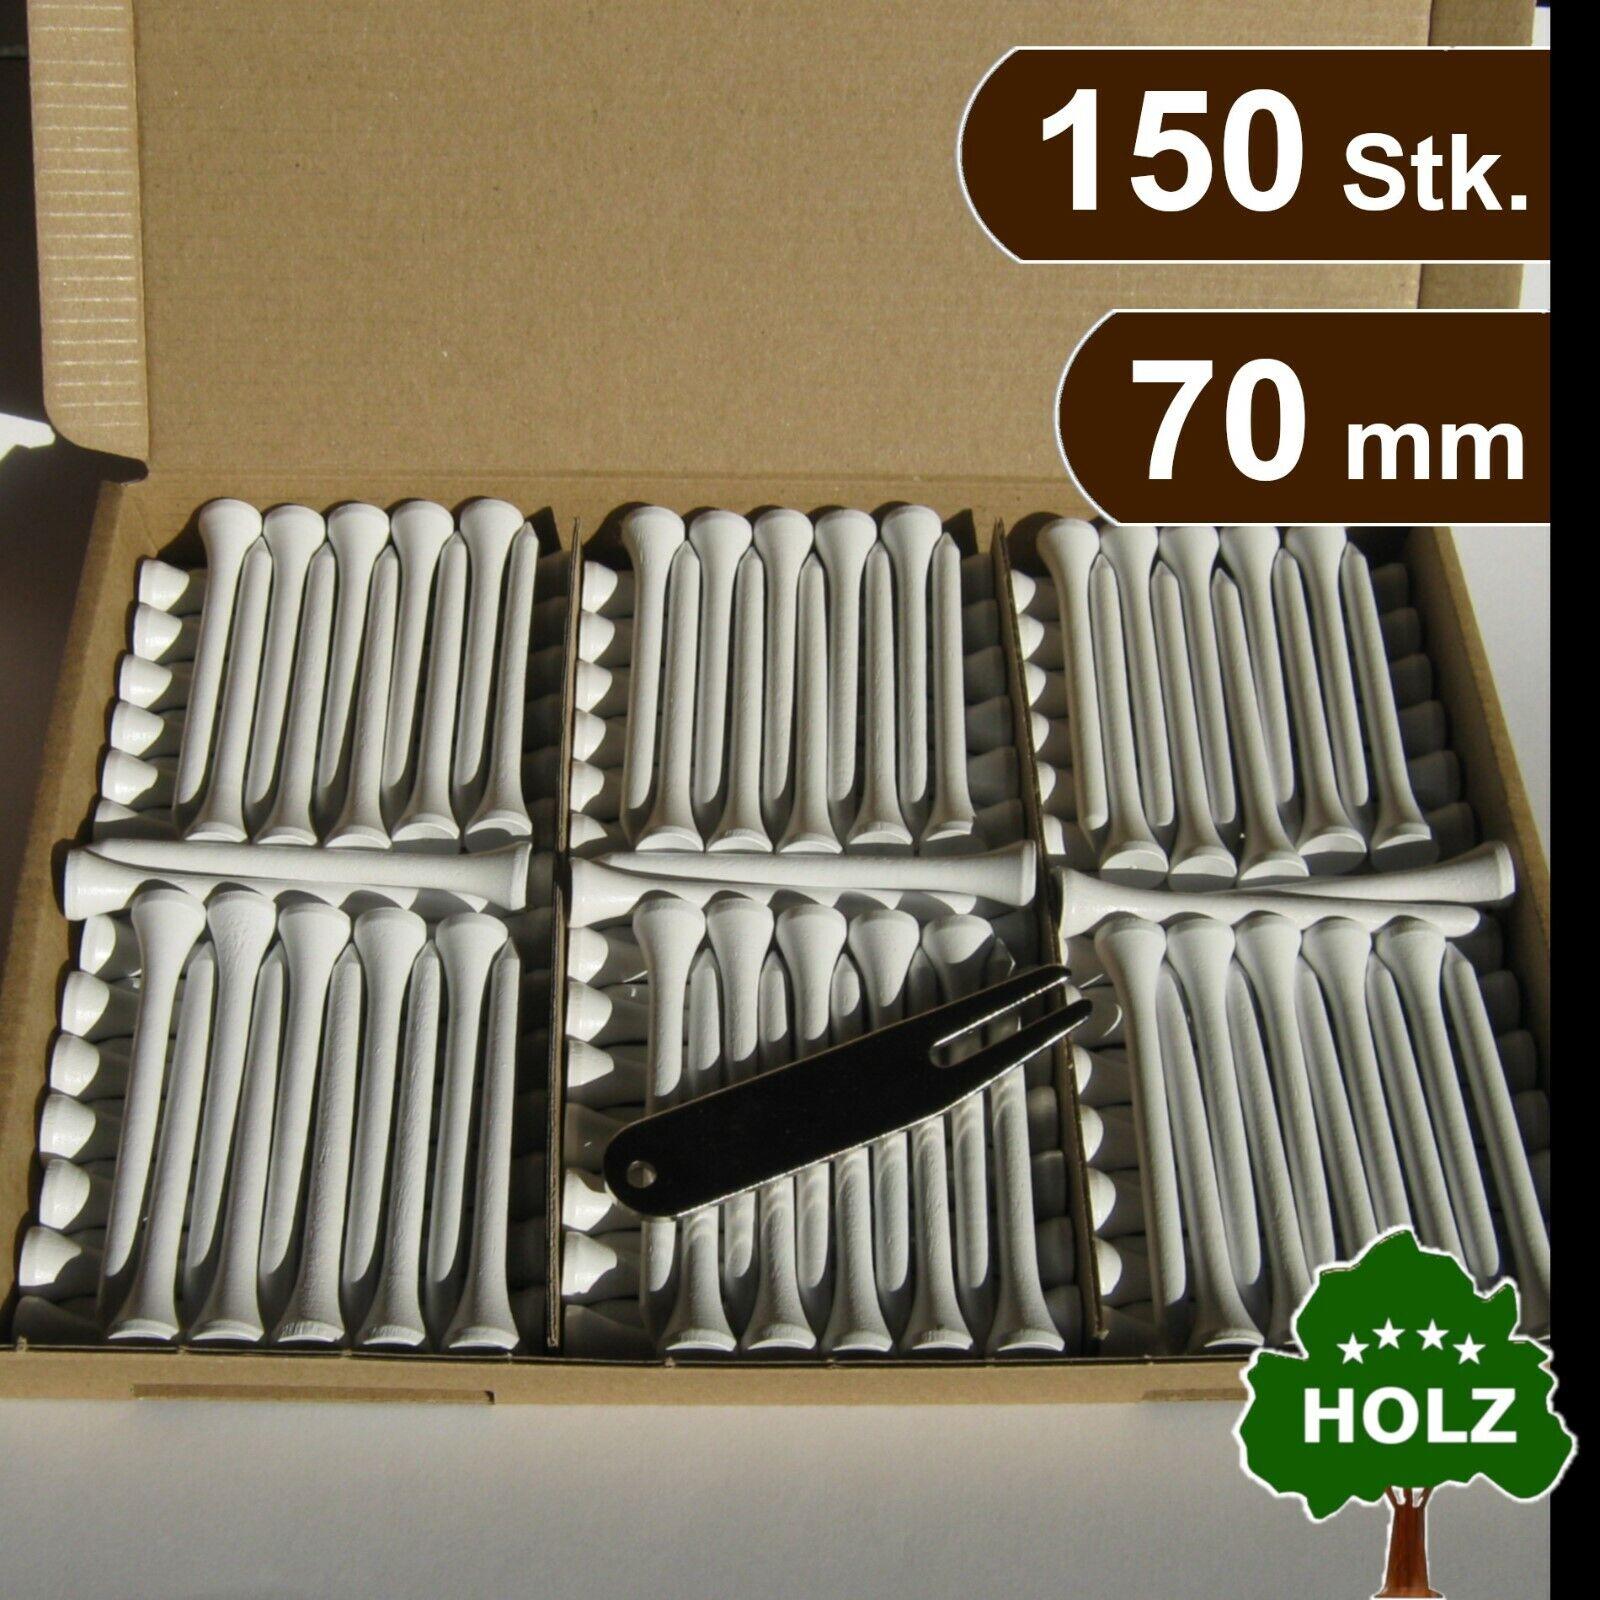 GOLF TEES (Holz) + PITCHGABEL (Metall) - 70 mm - 150 Stk. - weiß -> premium Set